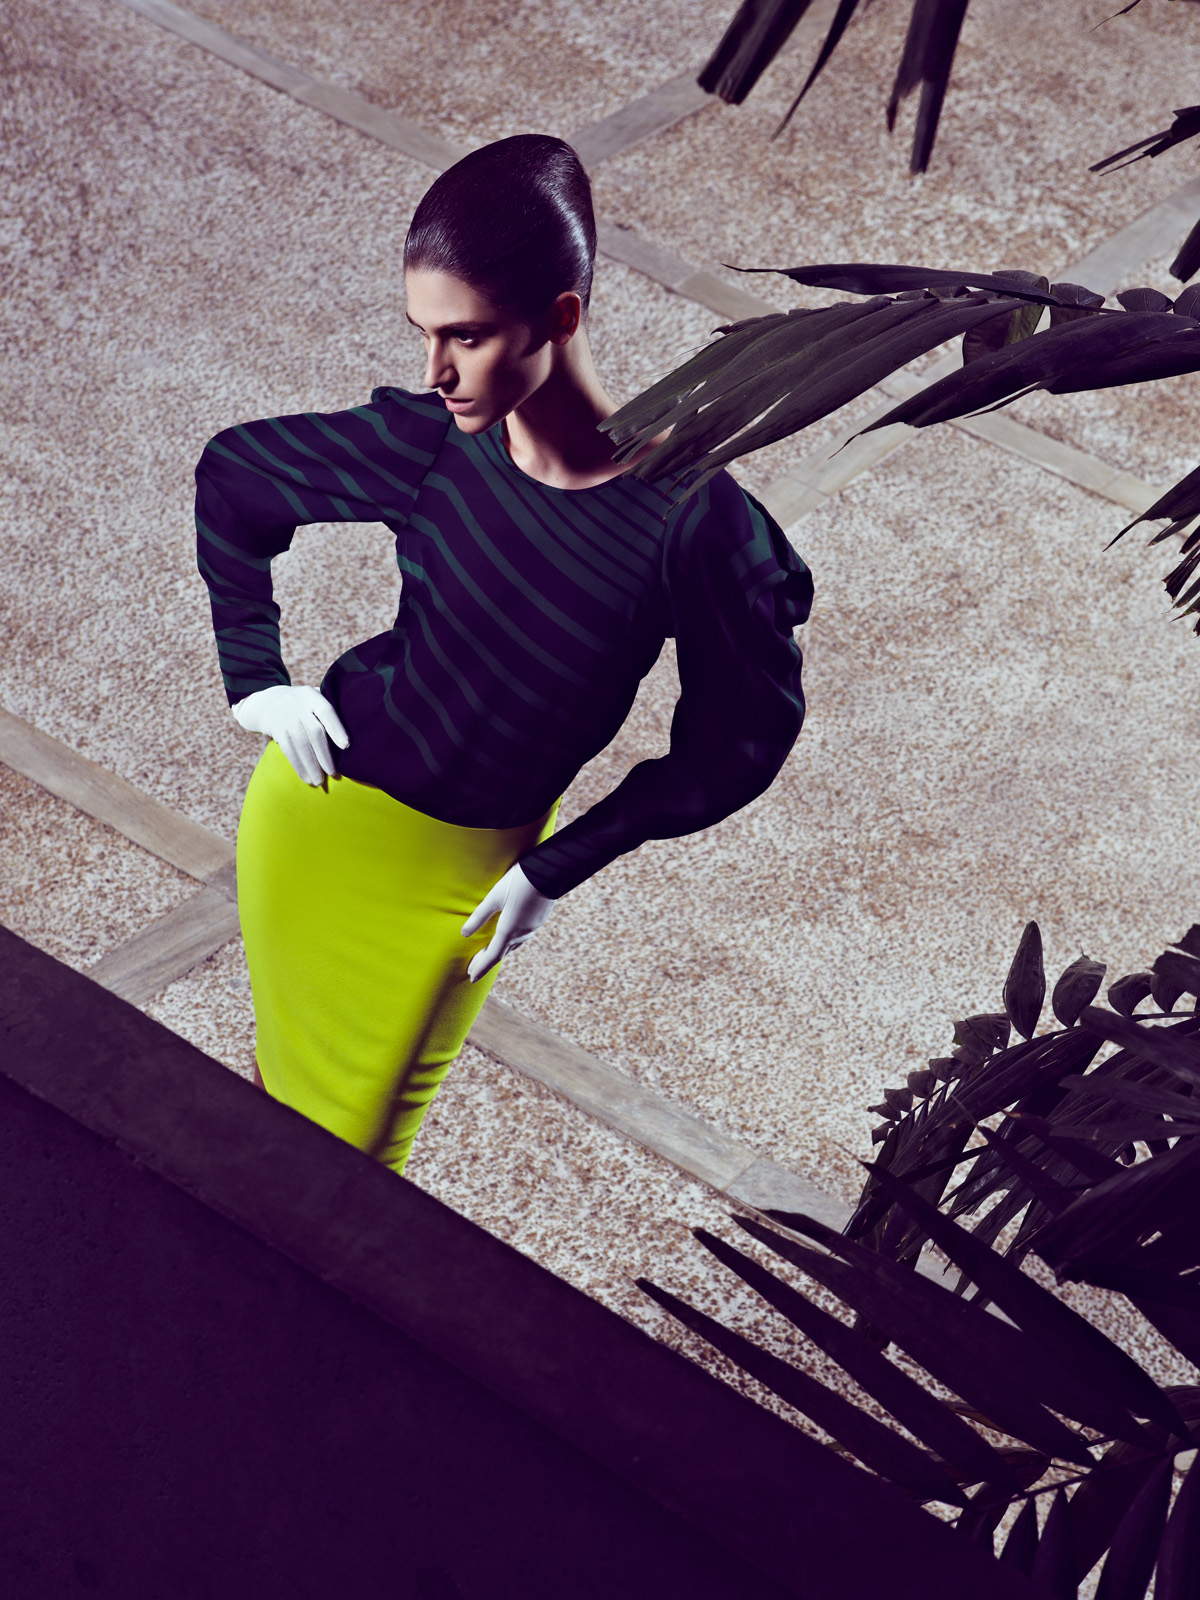 Daiane Conterato by Zee Nunes (Lady Liberty - Elle Brazil February 2012)